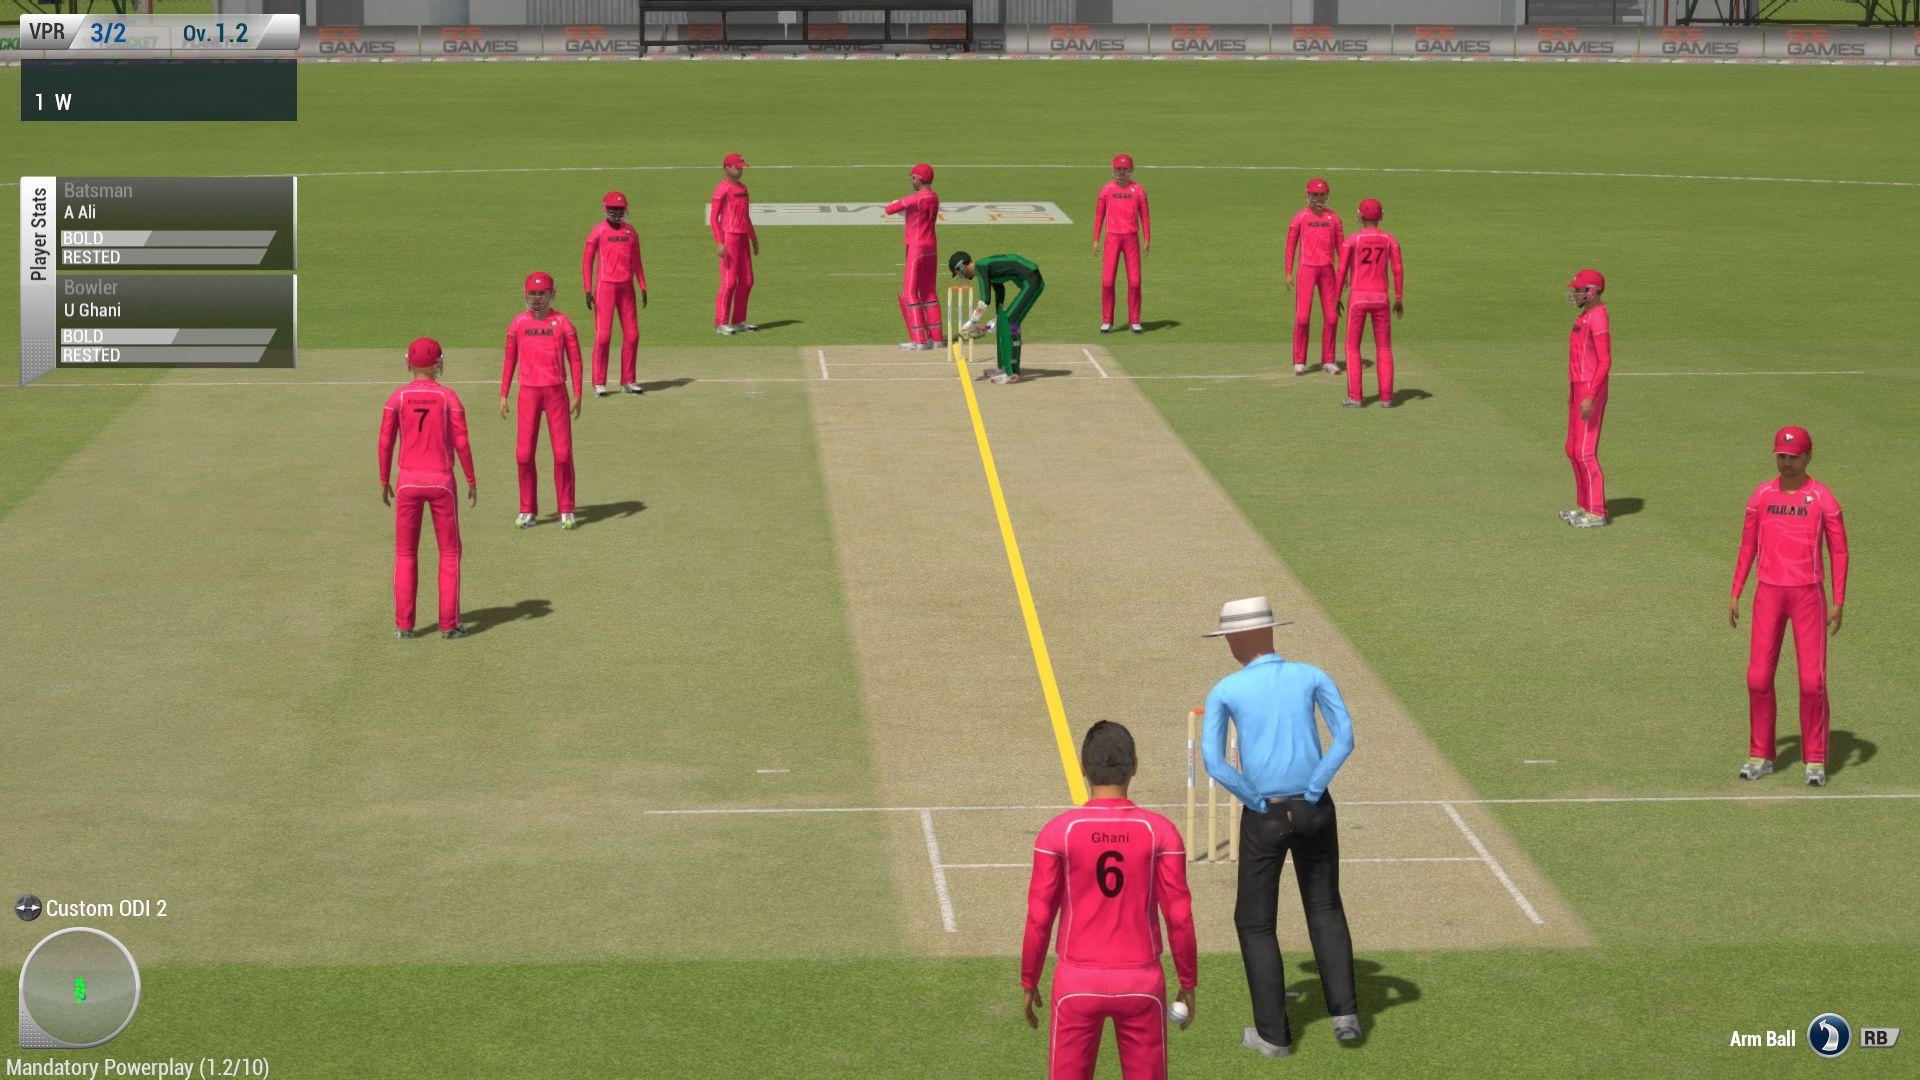 Download cricket 07 game free - Softoniccom